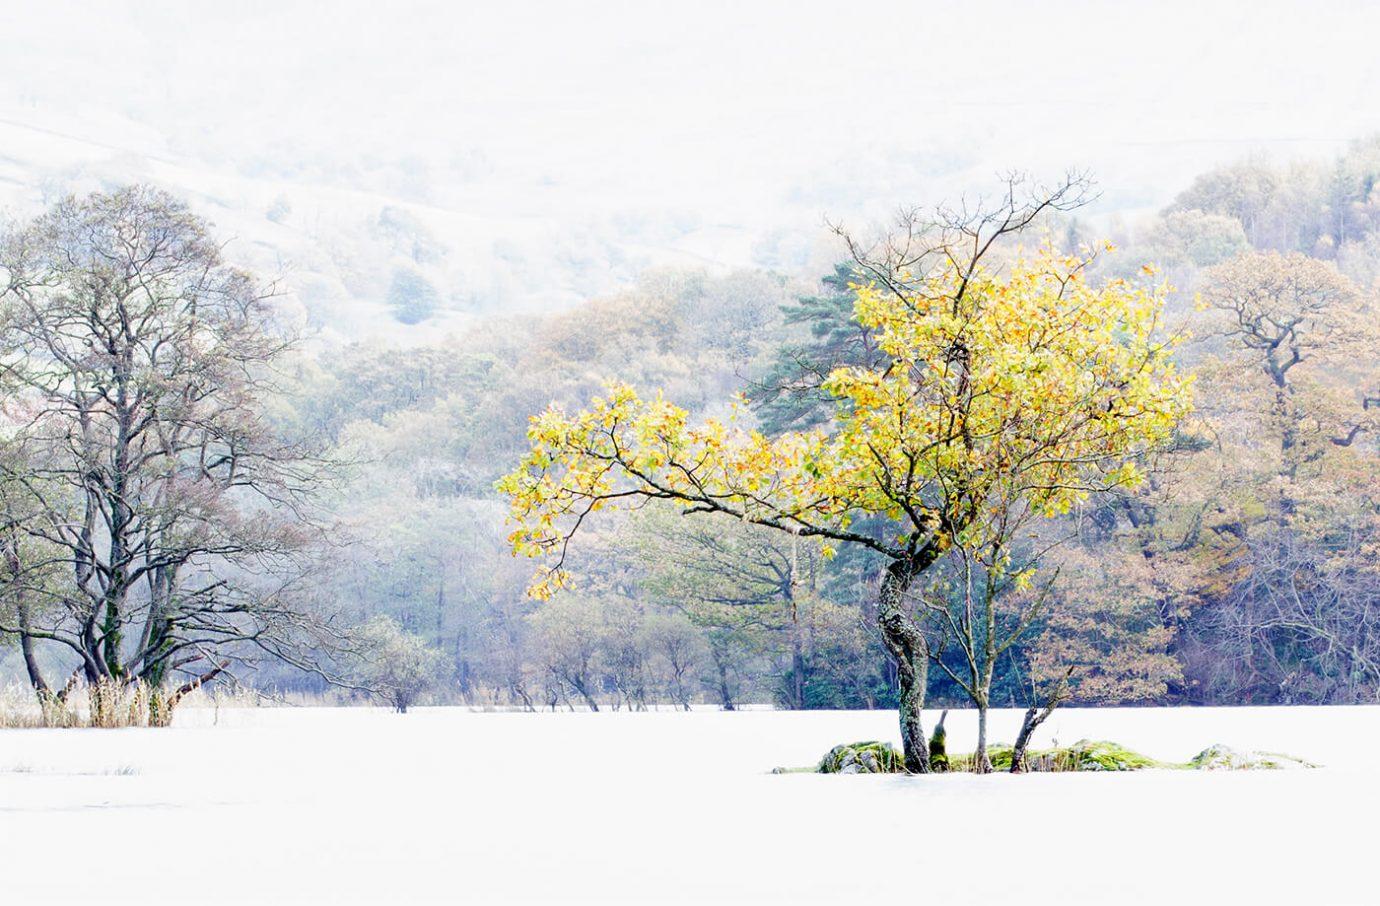 Rydal Tree, Rydal Water, Lake District